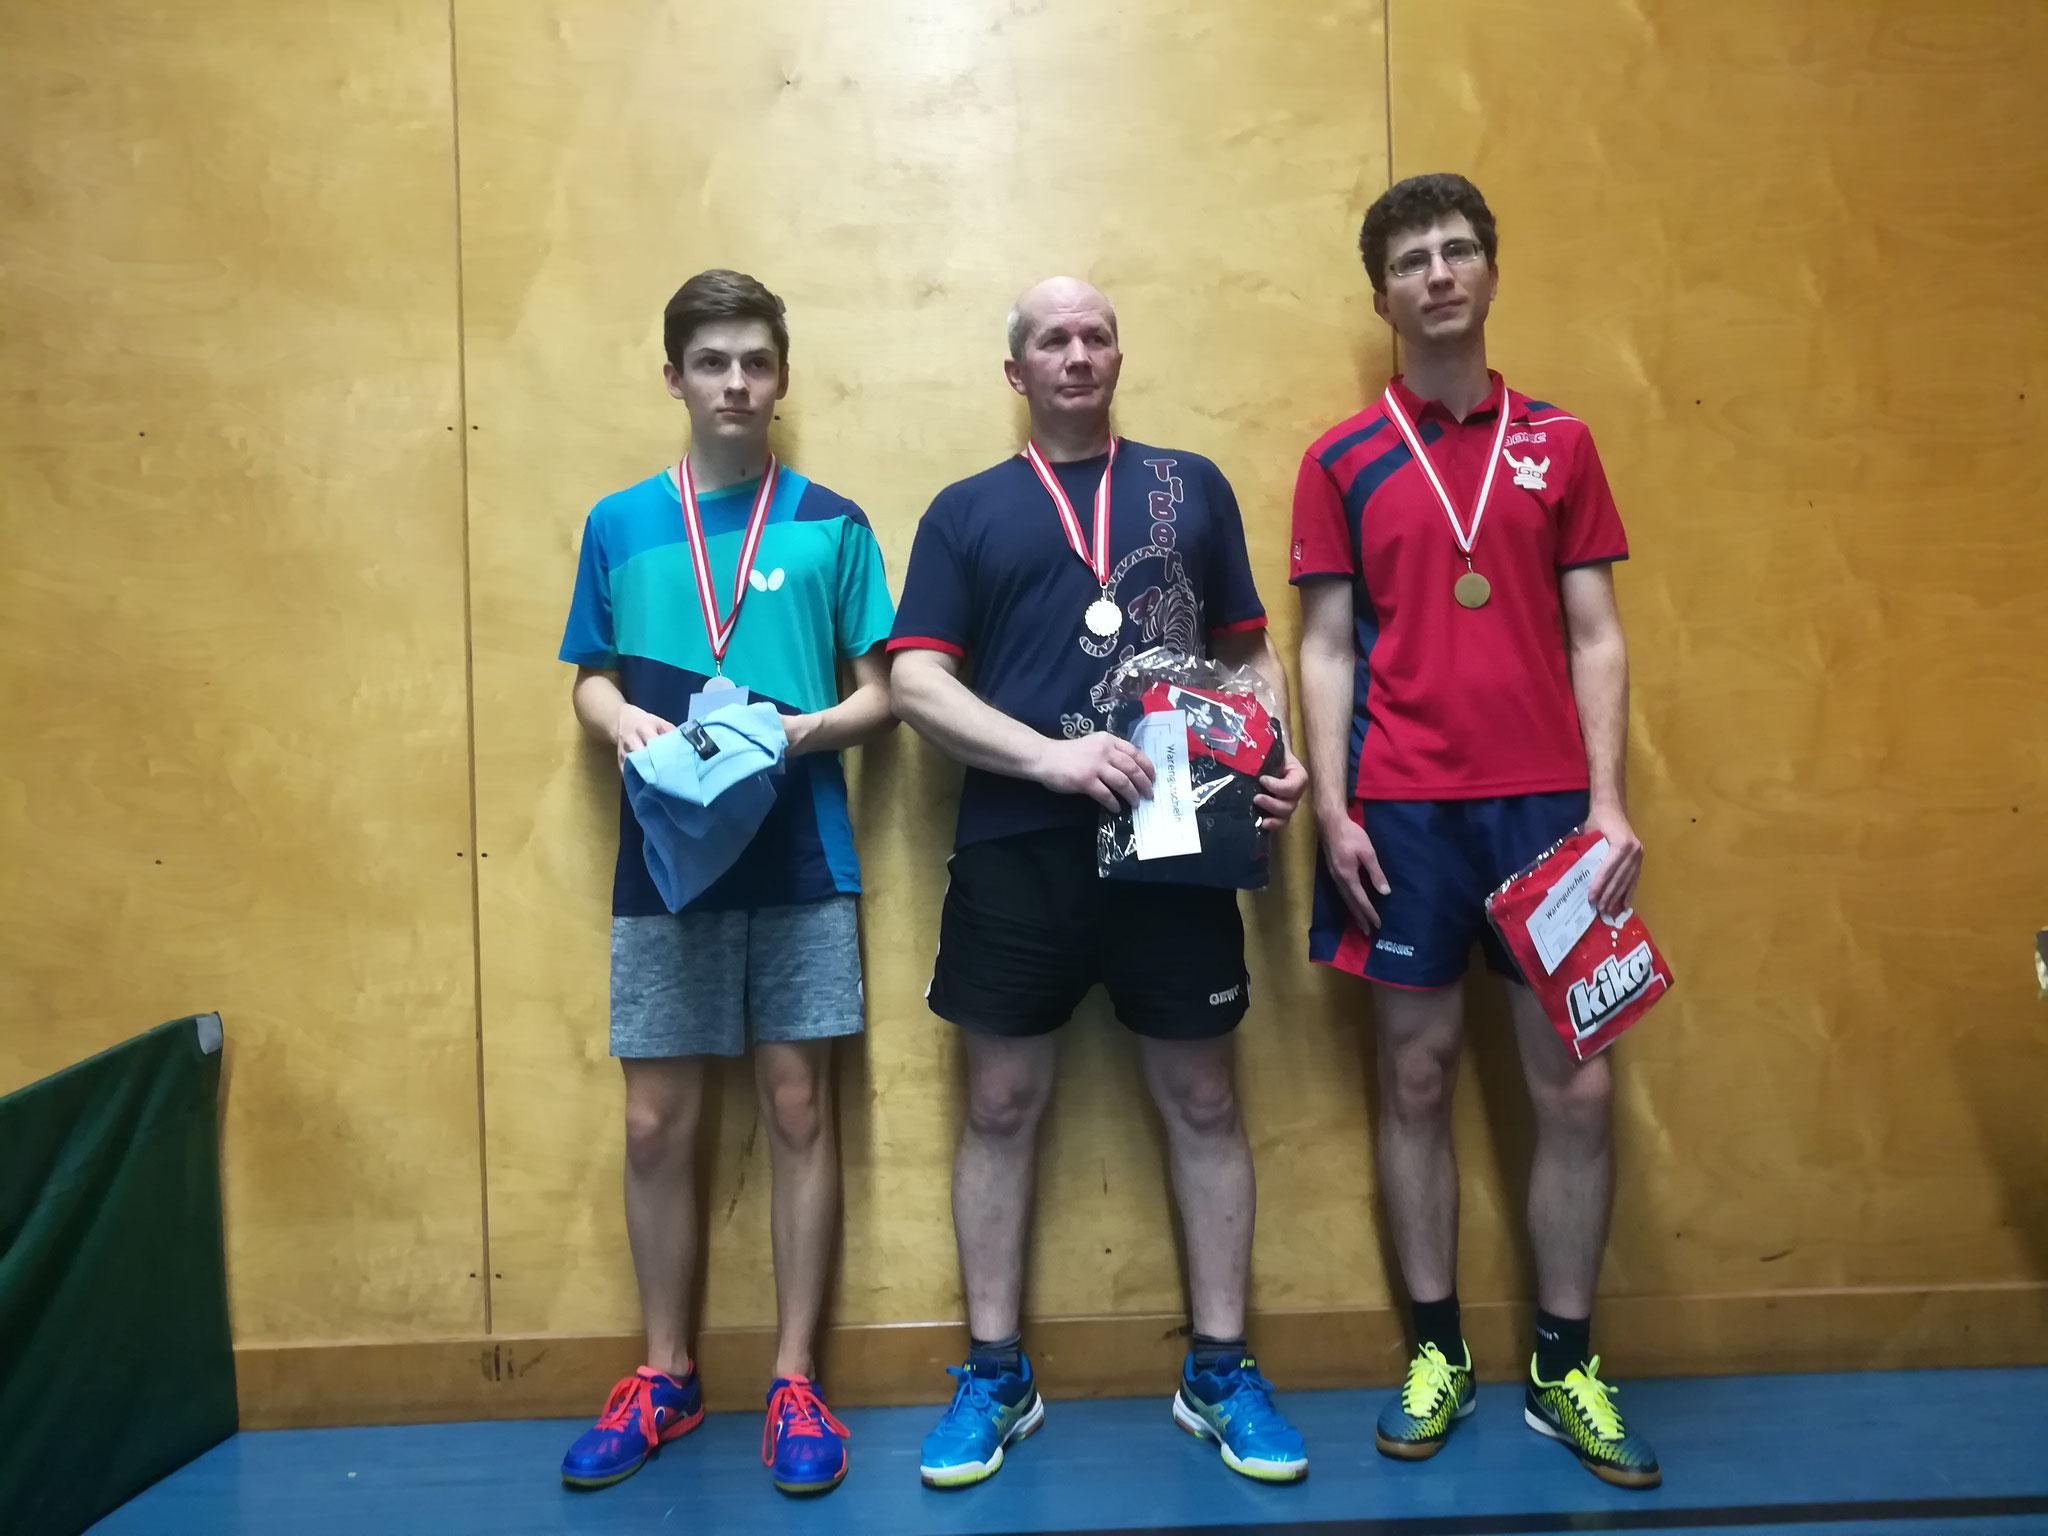 Siegerfoto Bewerb E: v.l.n.r. David Brandl (SSTO) (Platz 2), Endre Pelsöczi (URAP) (Sieger), Michael Holzmann (LENZ) (Platz 3)